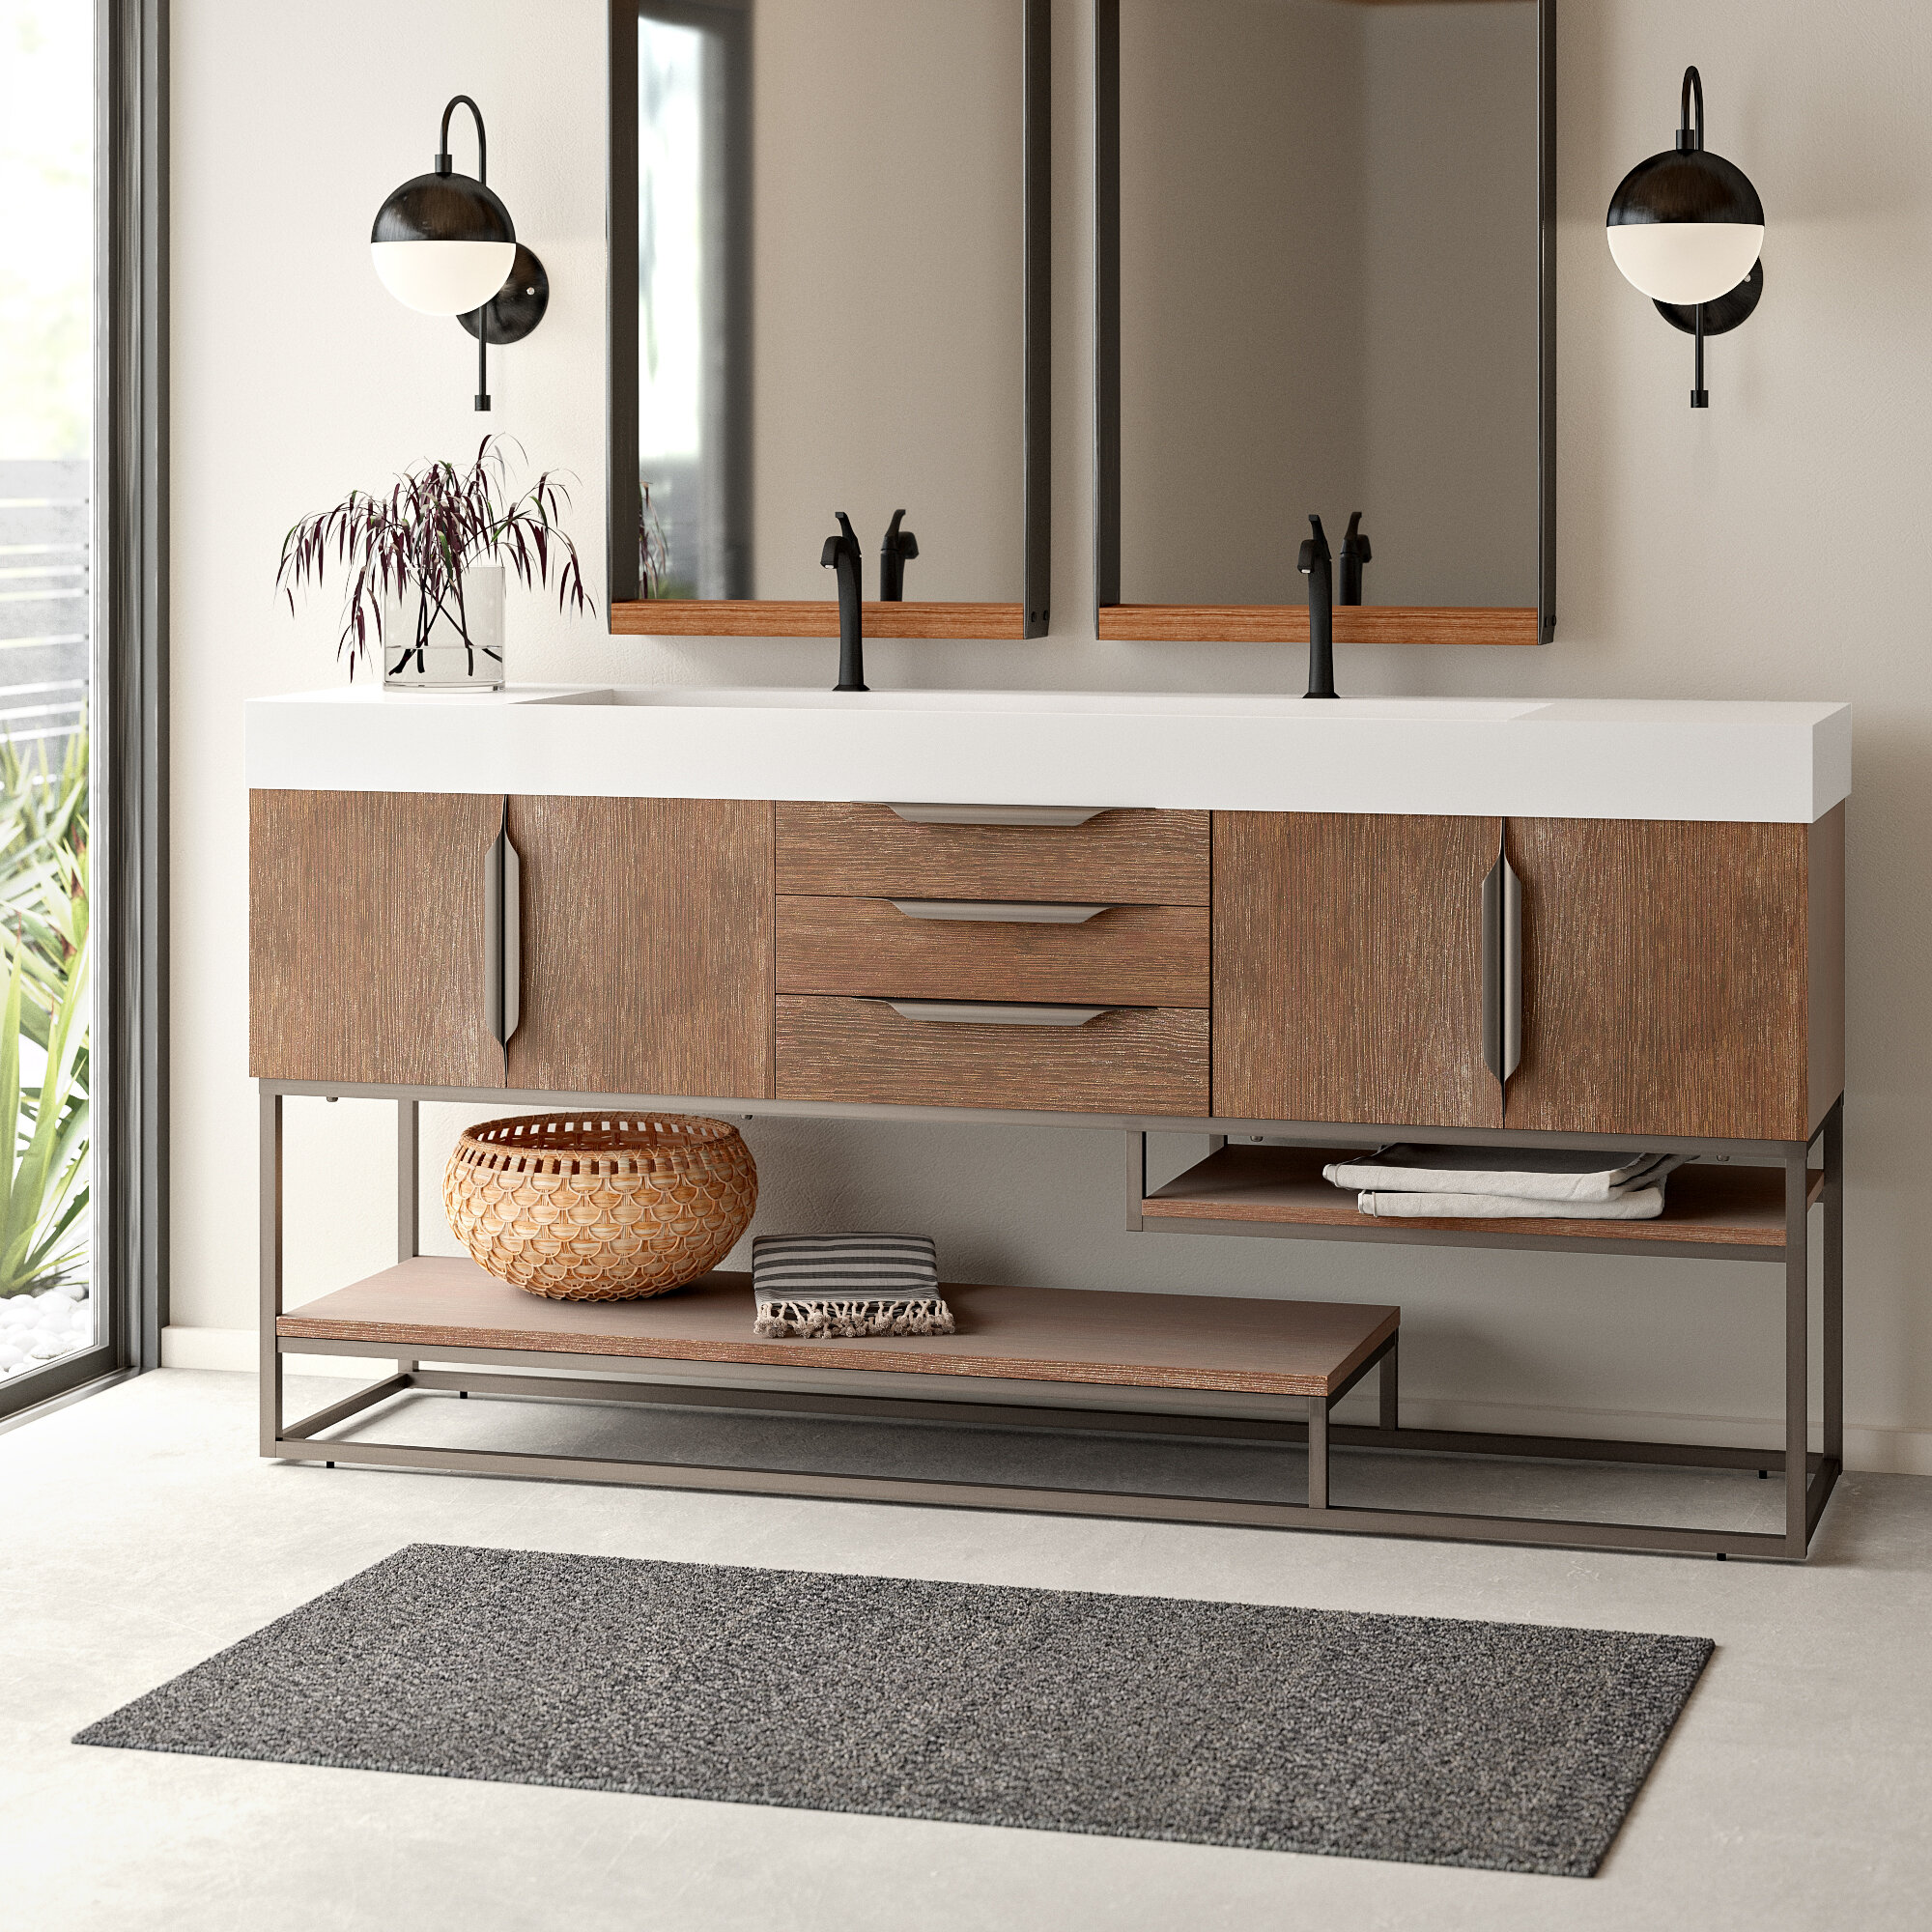 Image of: Kenton 73 Double Bathroom Vanity Set Reviews Allmodern